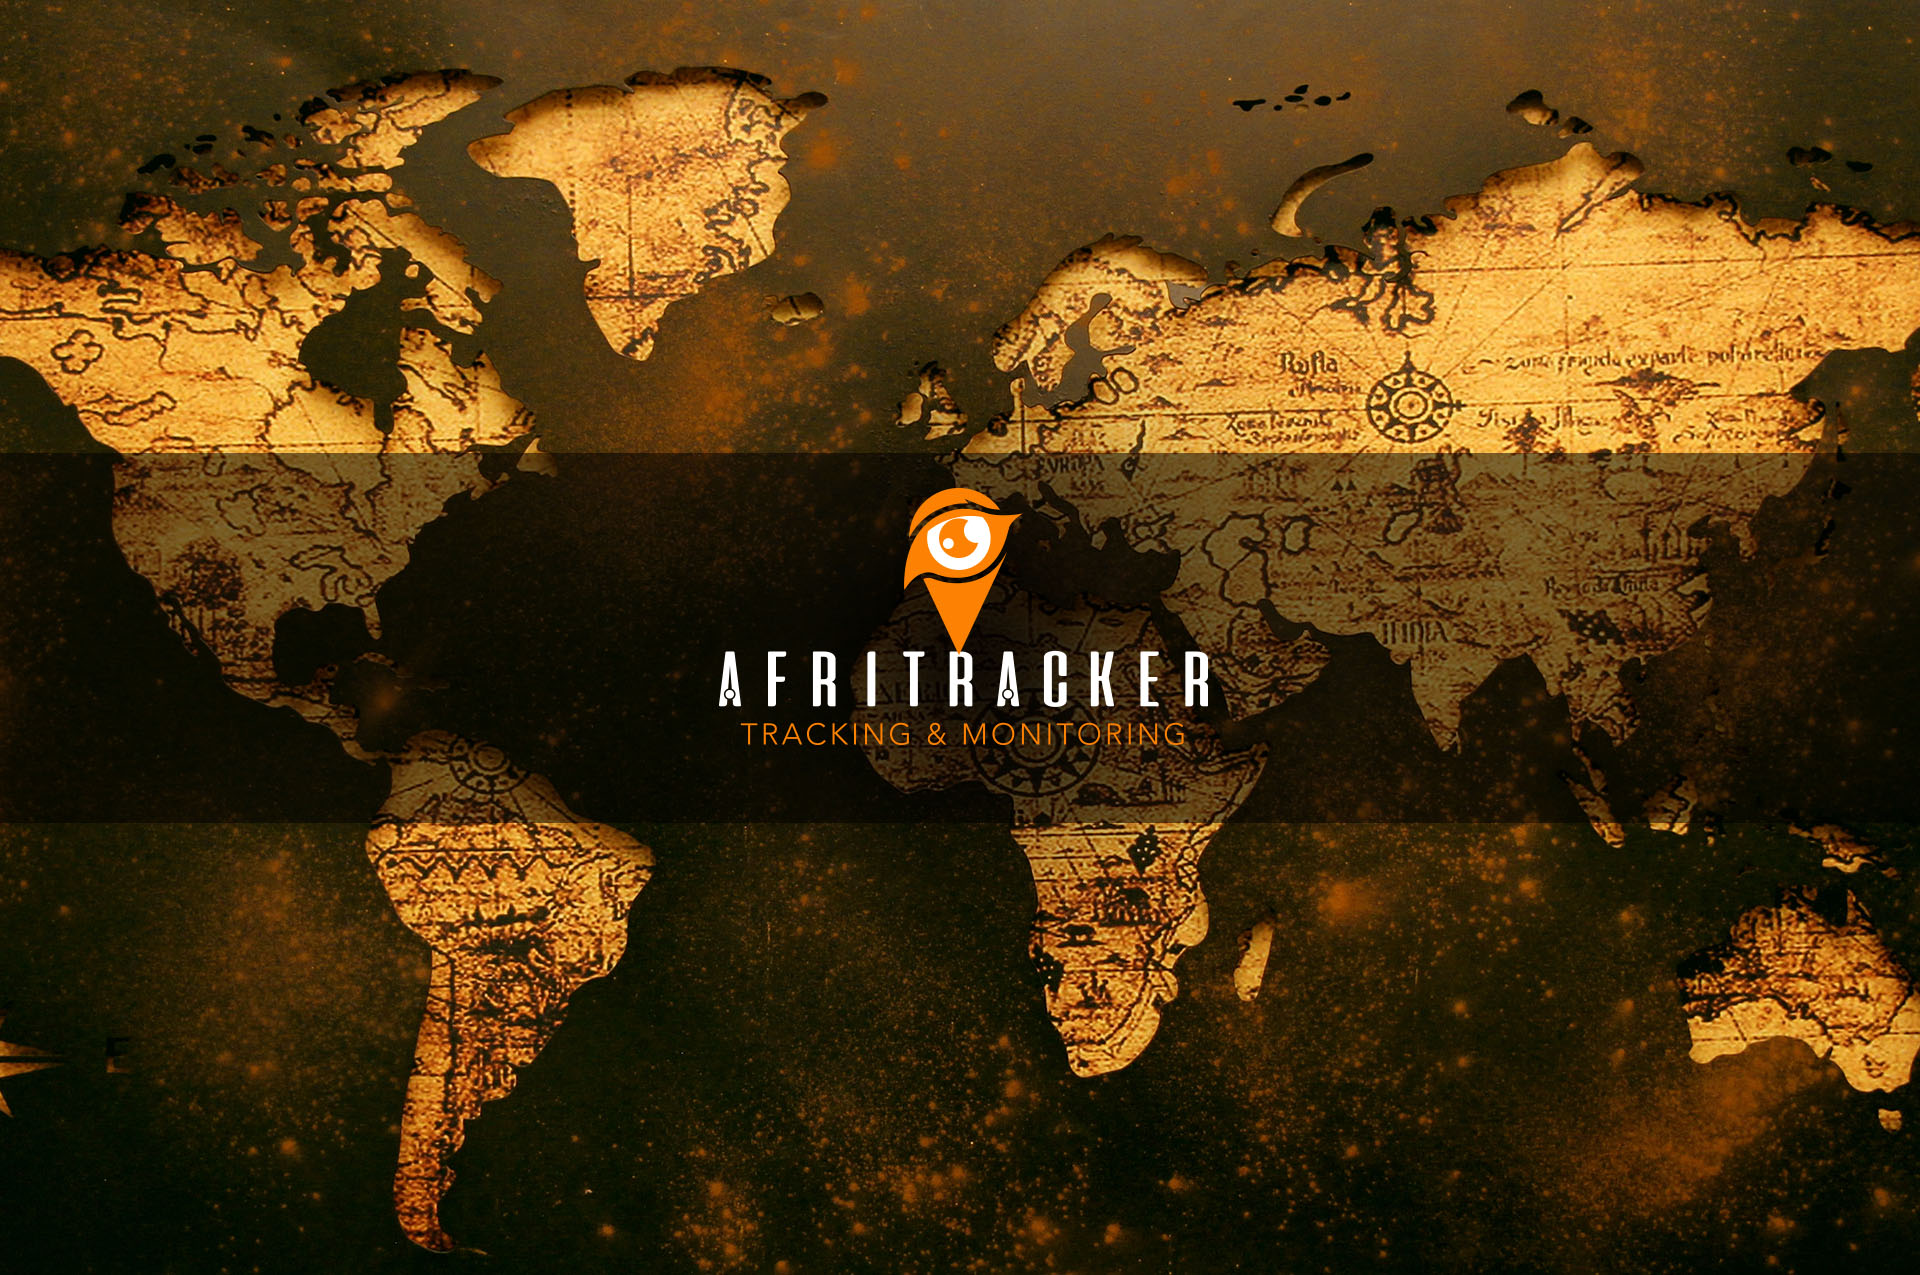 AFRITRACKER